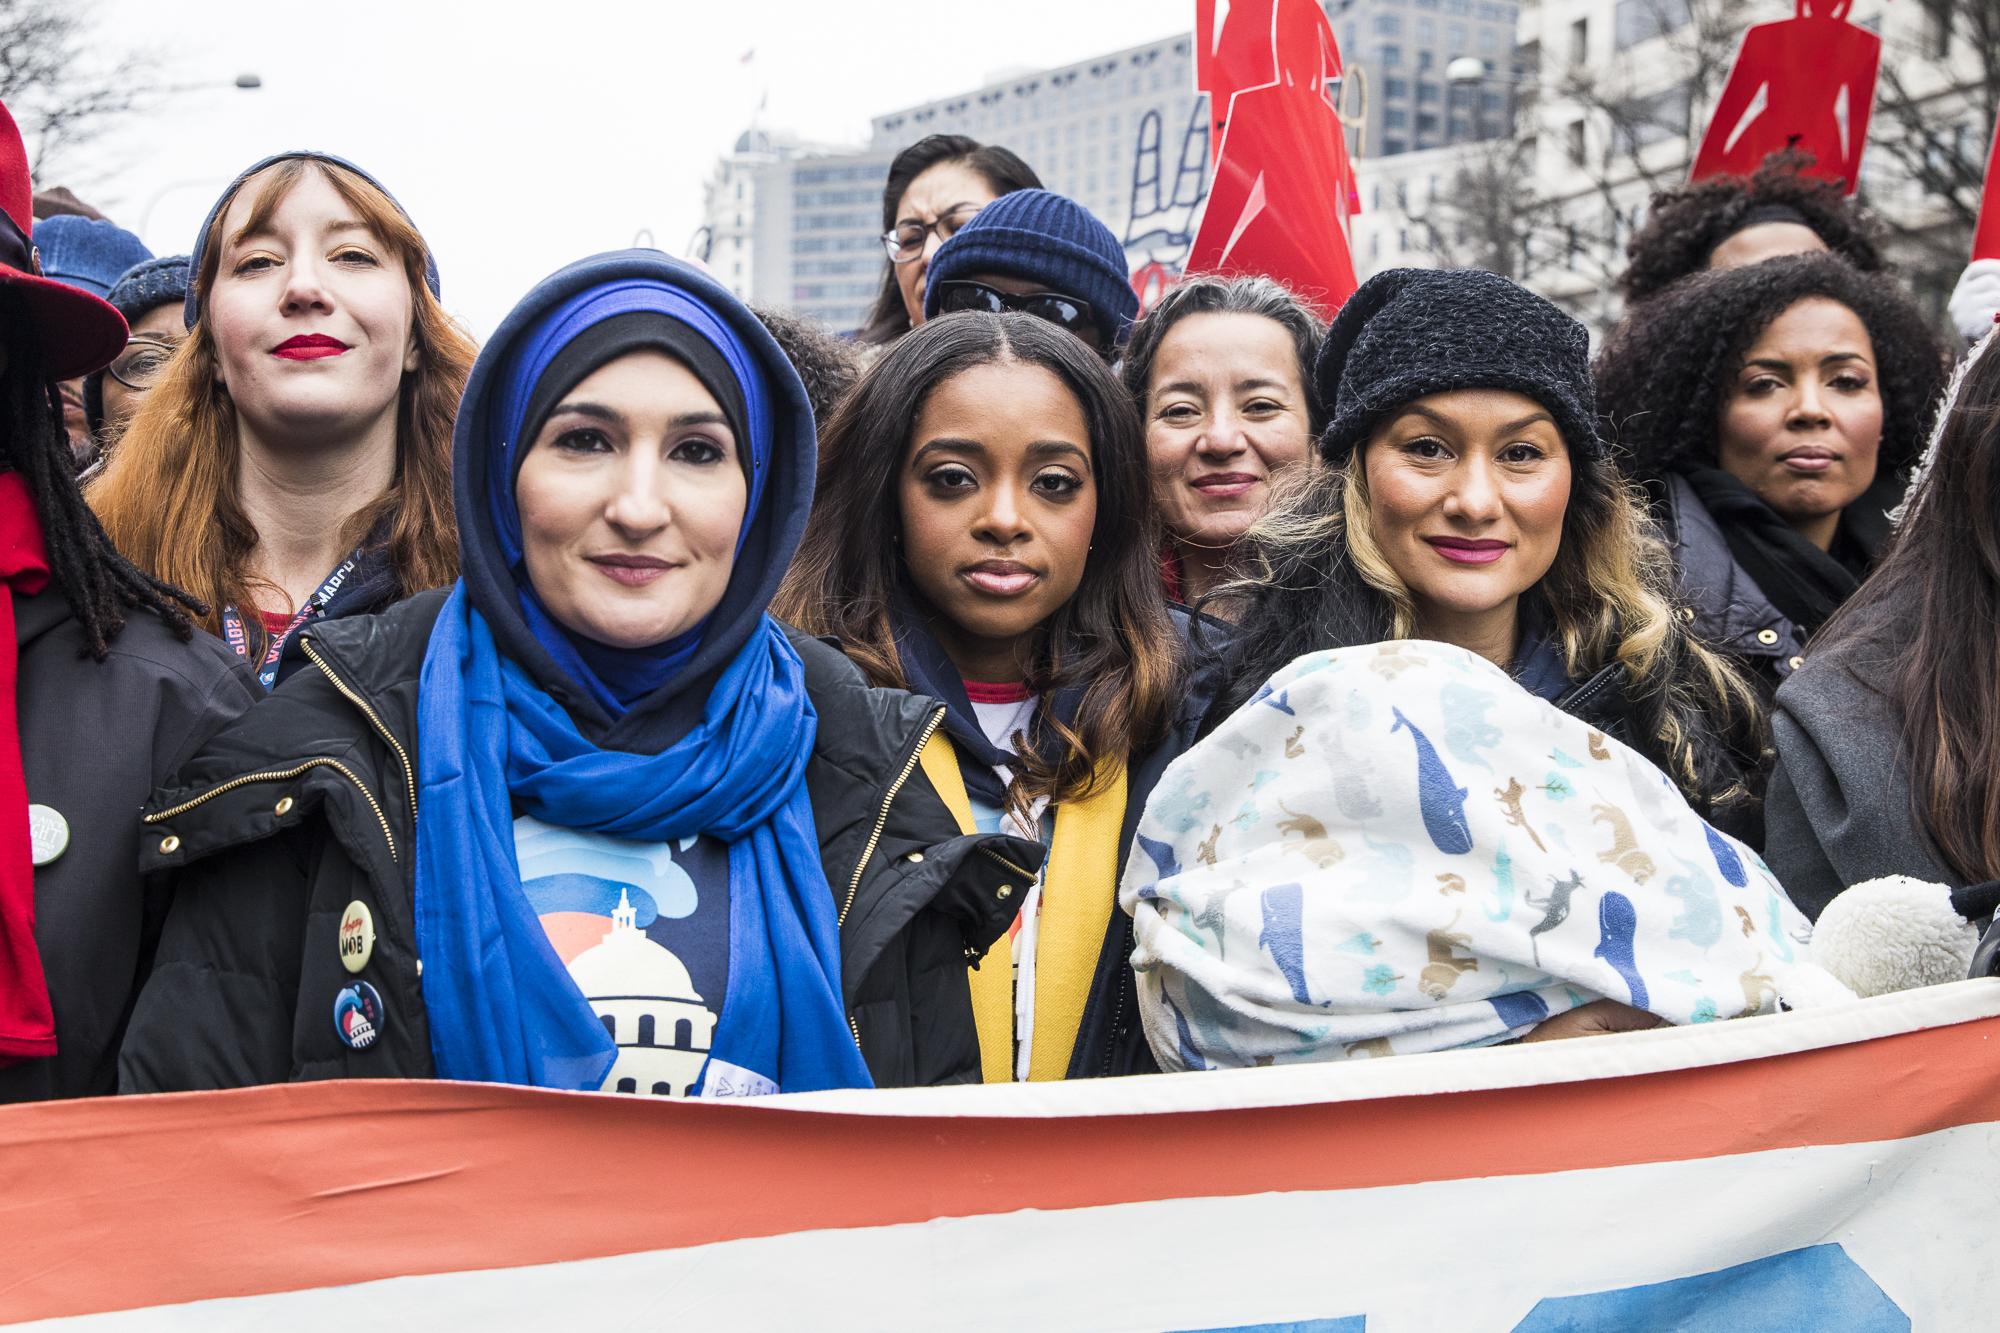 Linda Sarsour seen alongside the other organizers of the Women's March, including Bob Bland, Tamika Mallory, and Carmen Perez, January 21, Washington DC. (Kisha Bari)